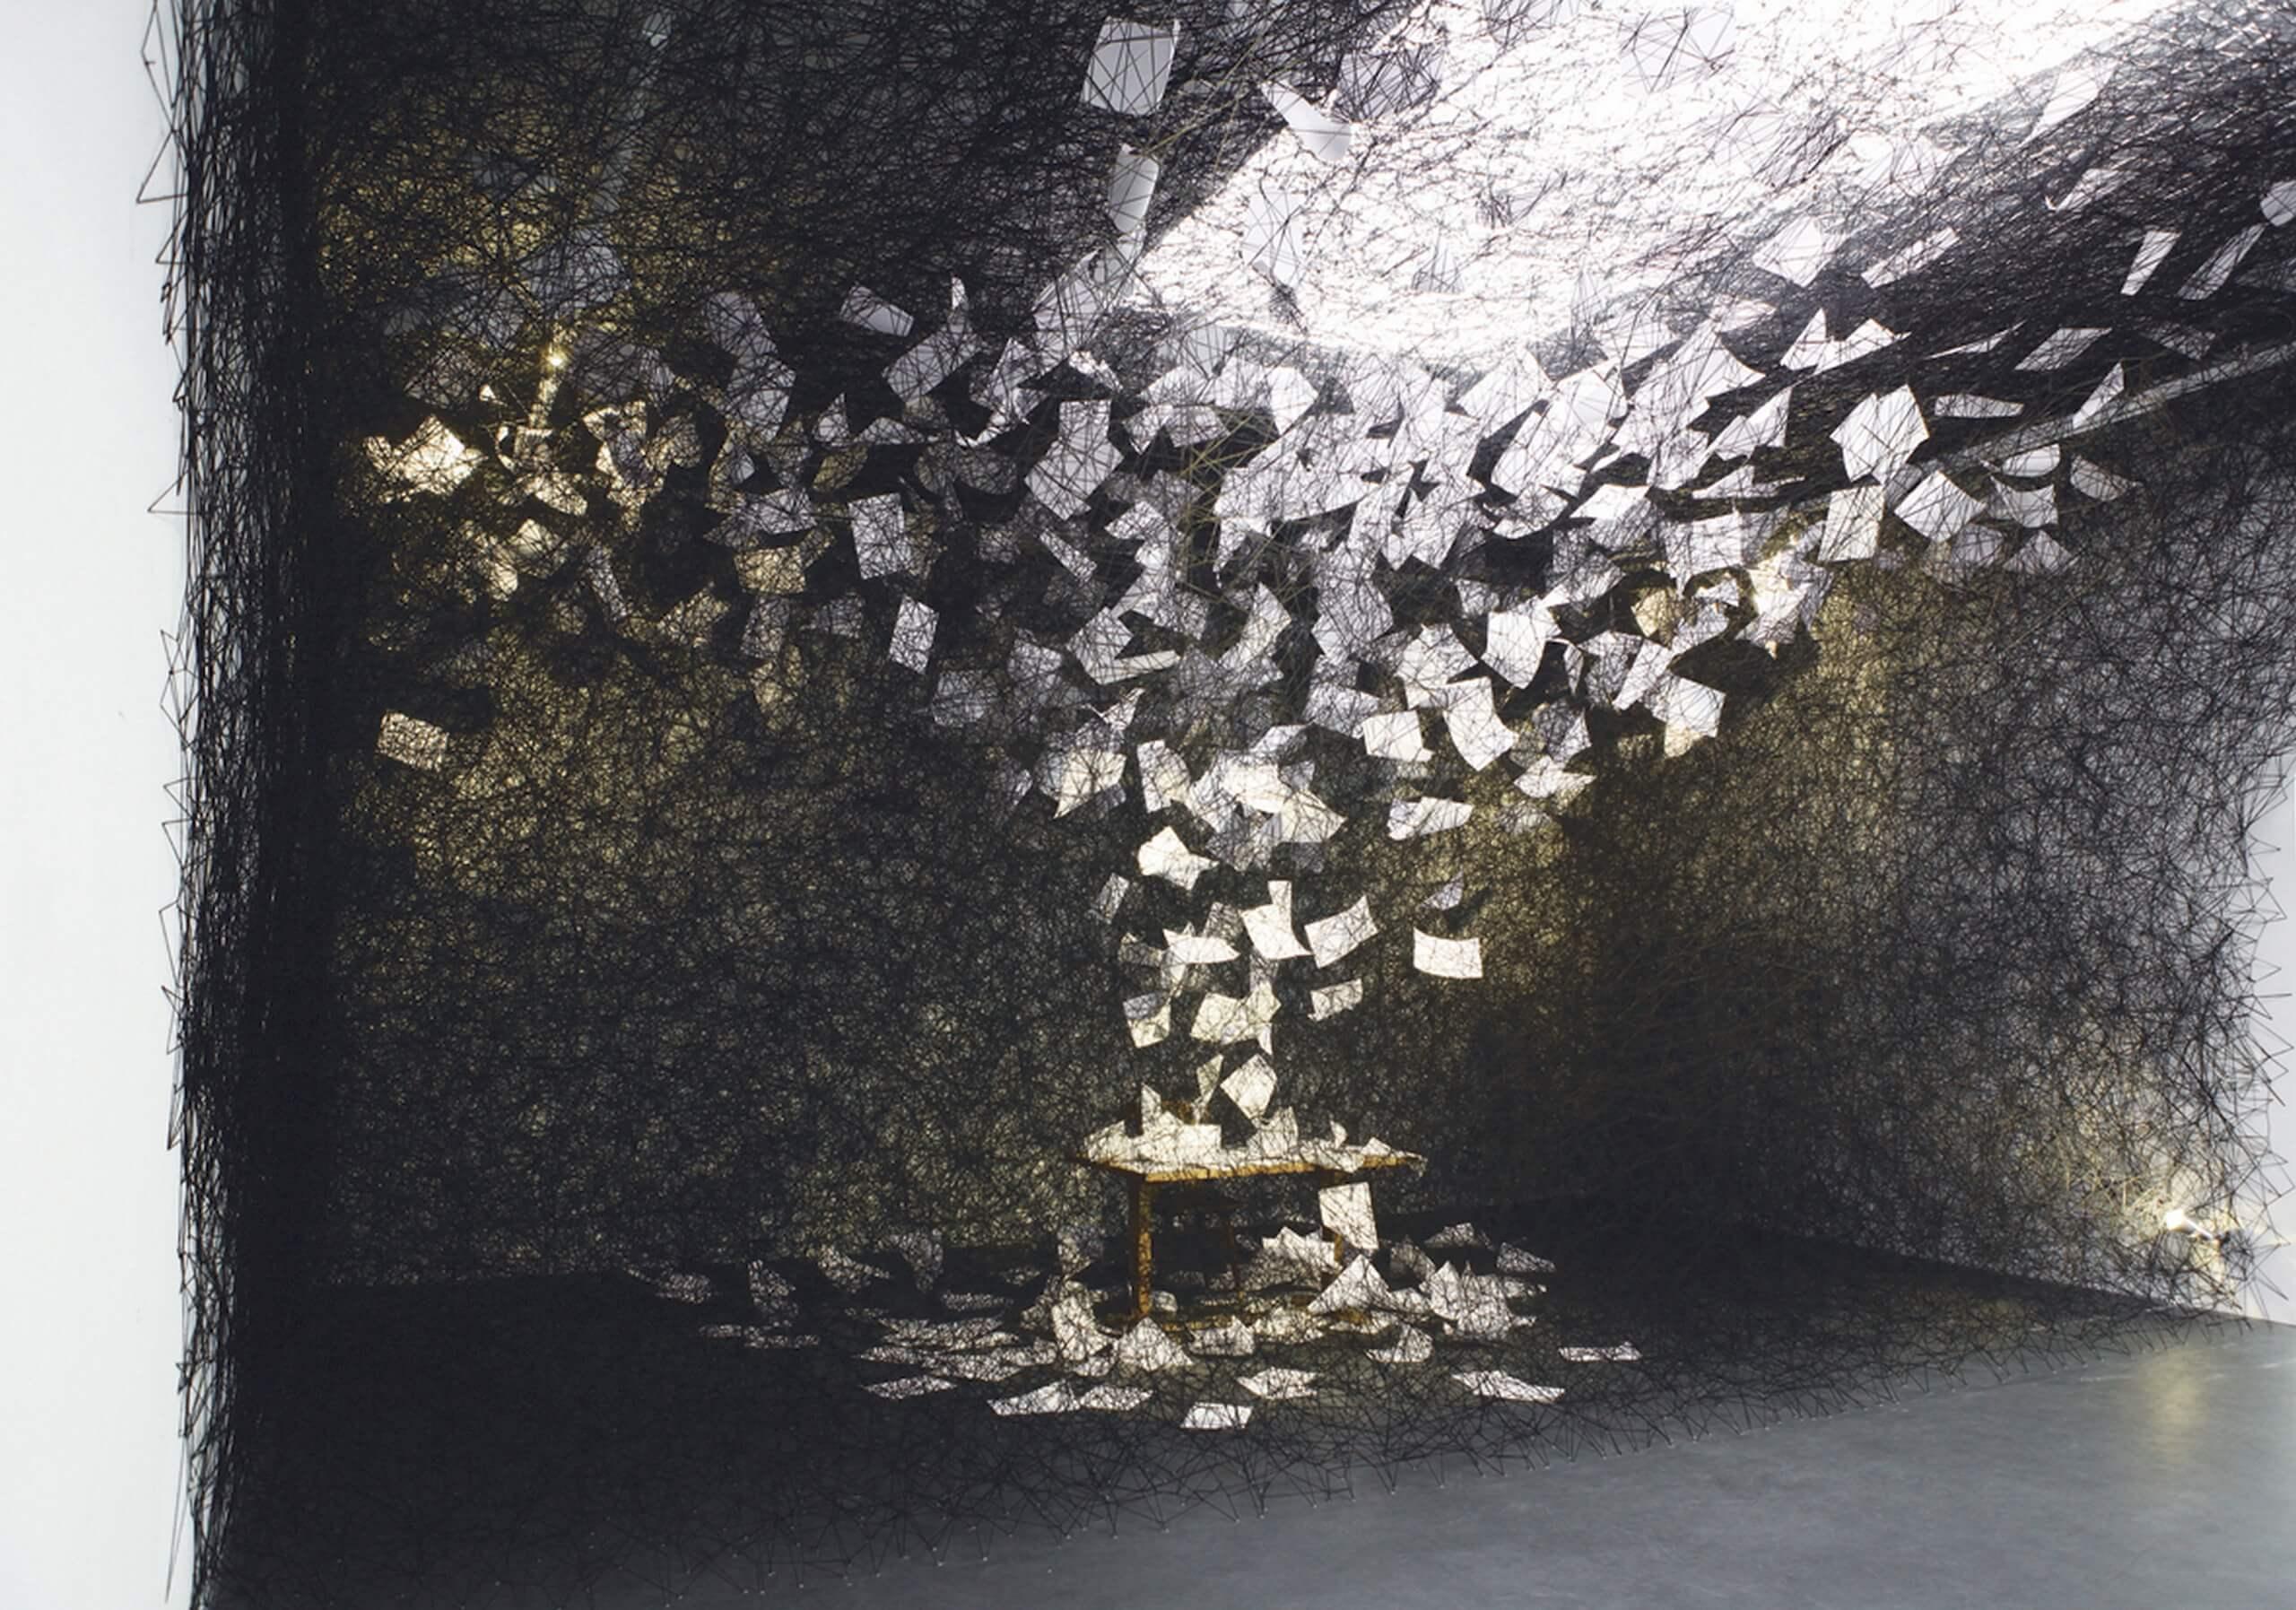 interlaken-kunsthaus-2015-kunsthaus-interlaken-chiharu-shiota